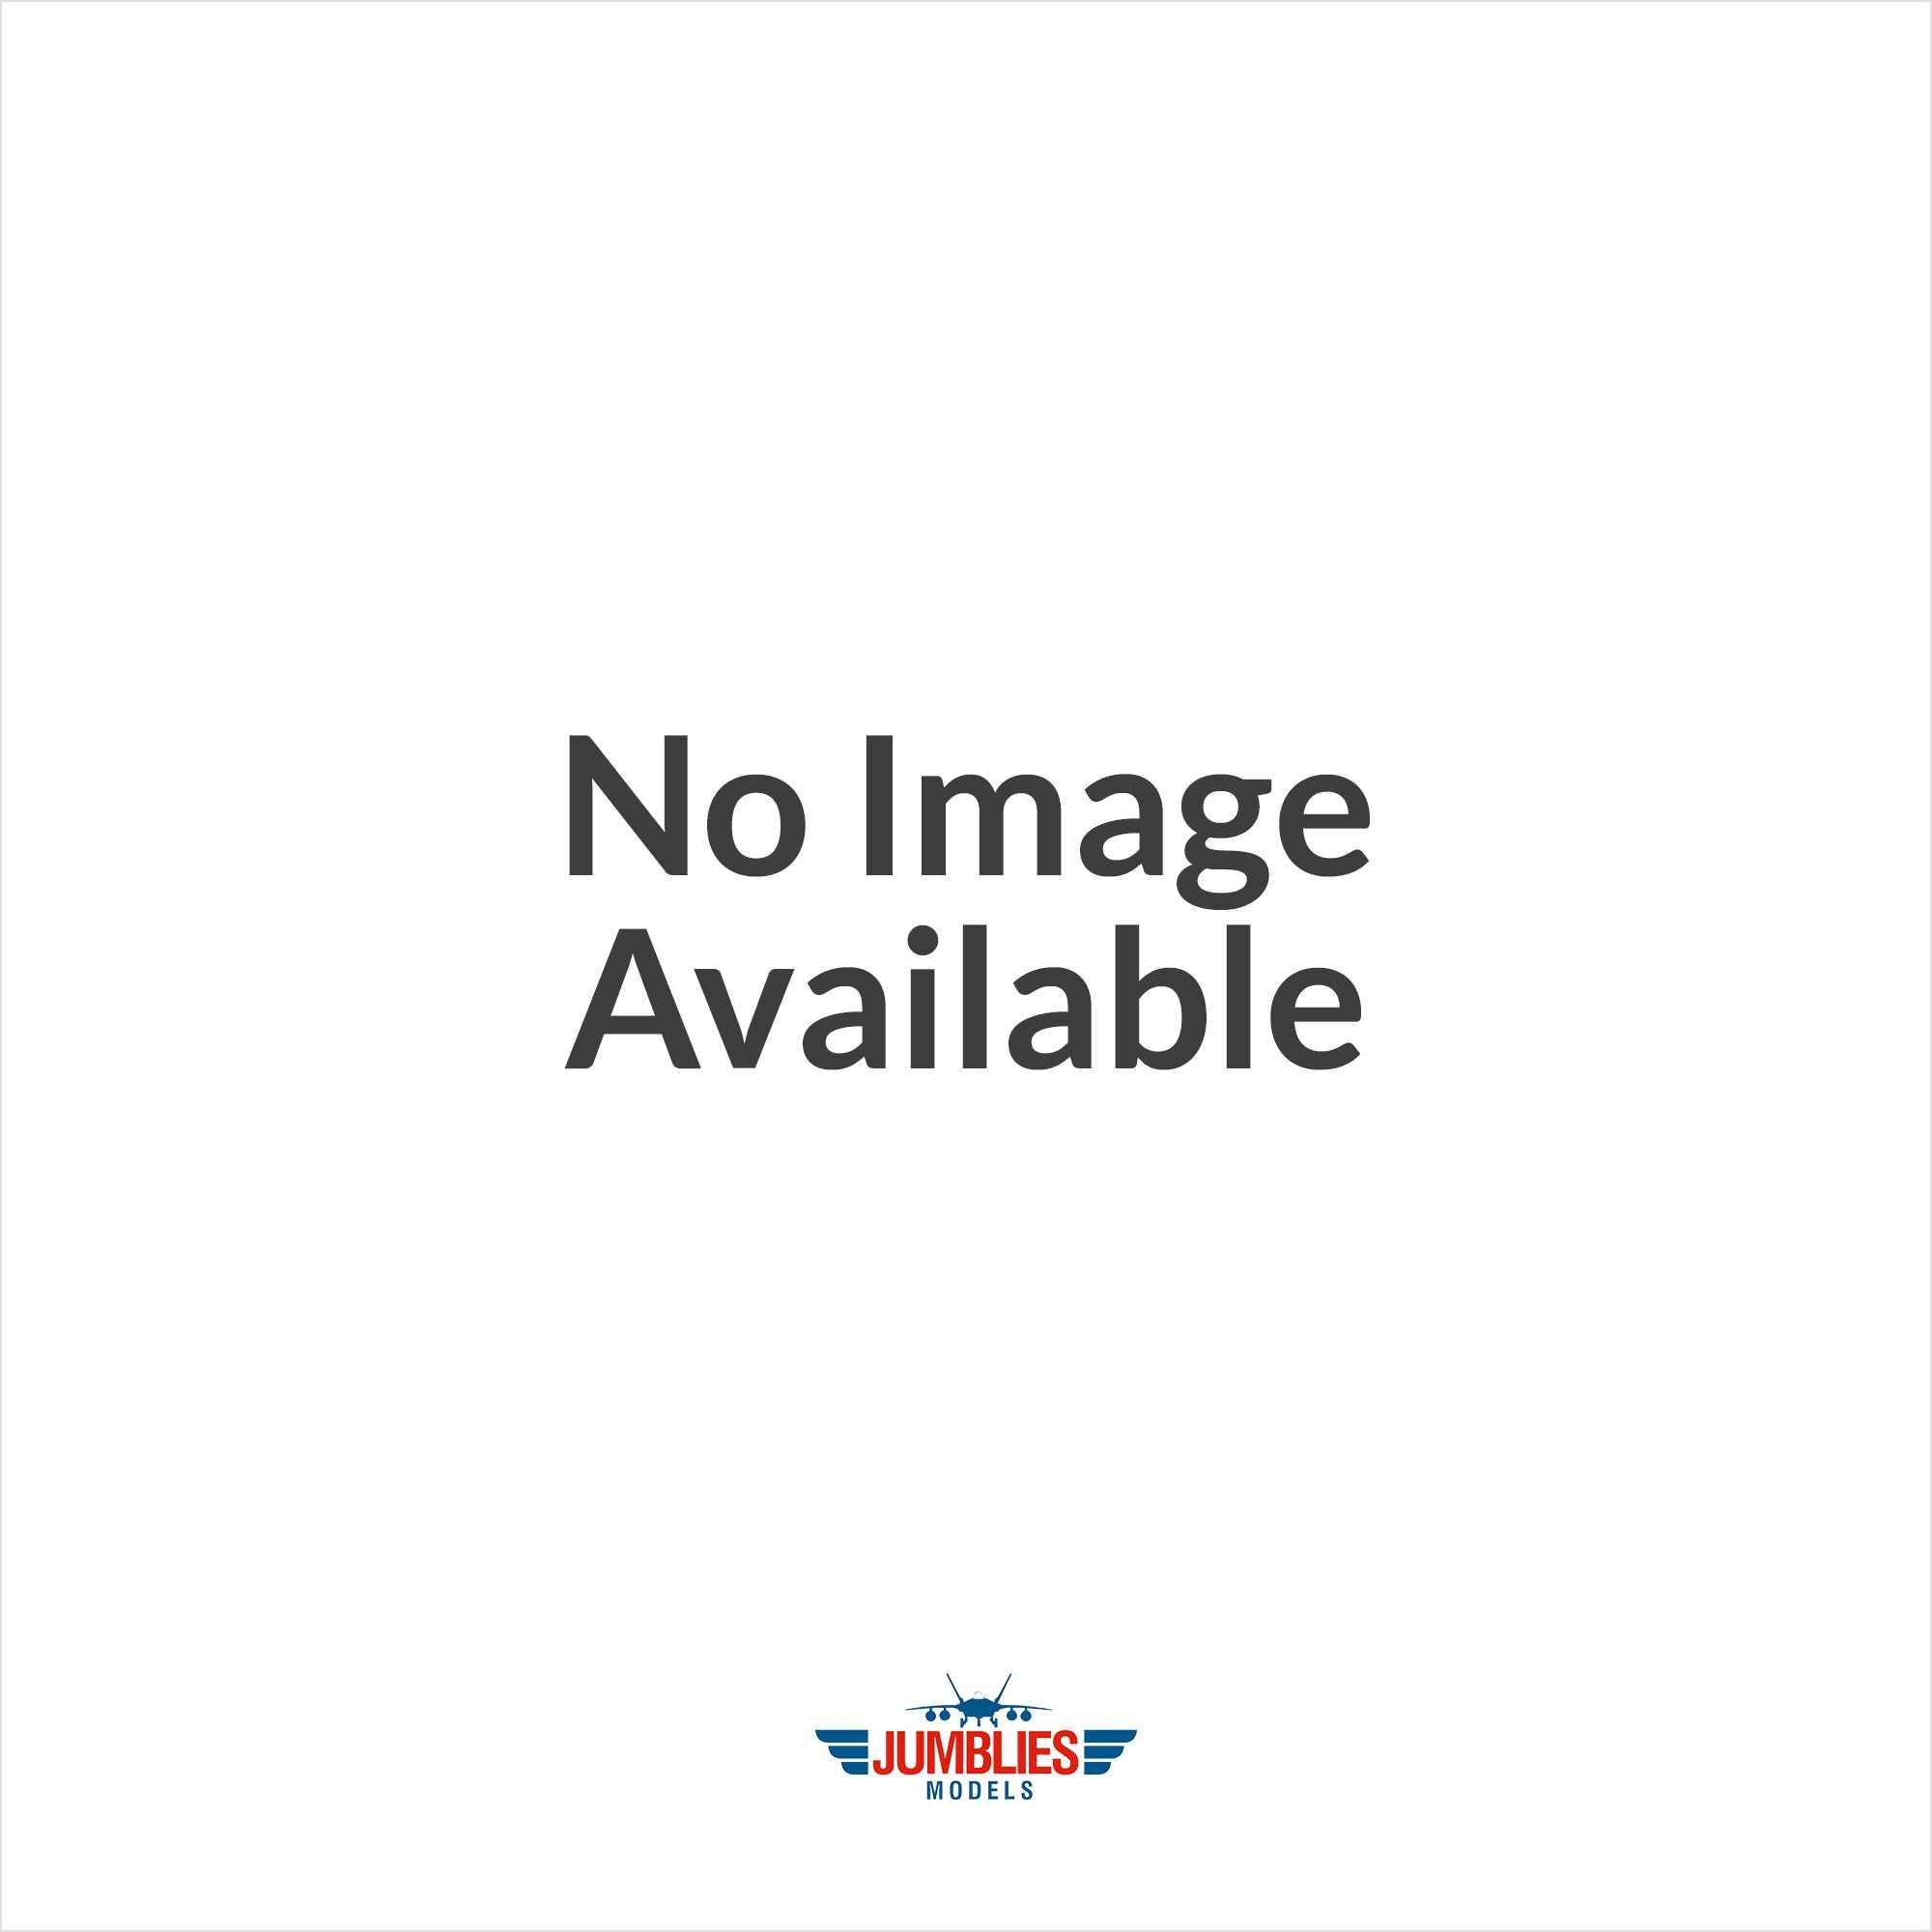 Gemini Jets 1:200 Boeing B777-300ER EMIRATES (New Expo 2020) Reg - A6-ENU